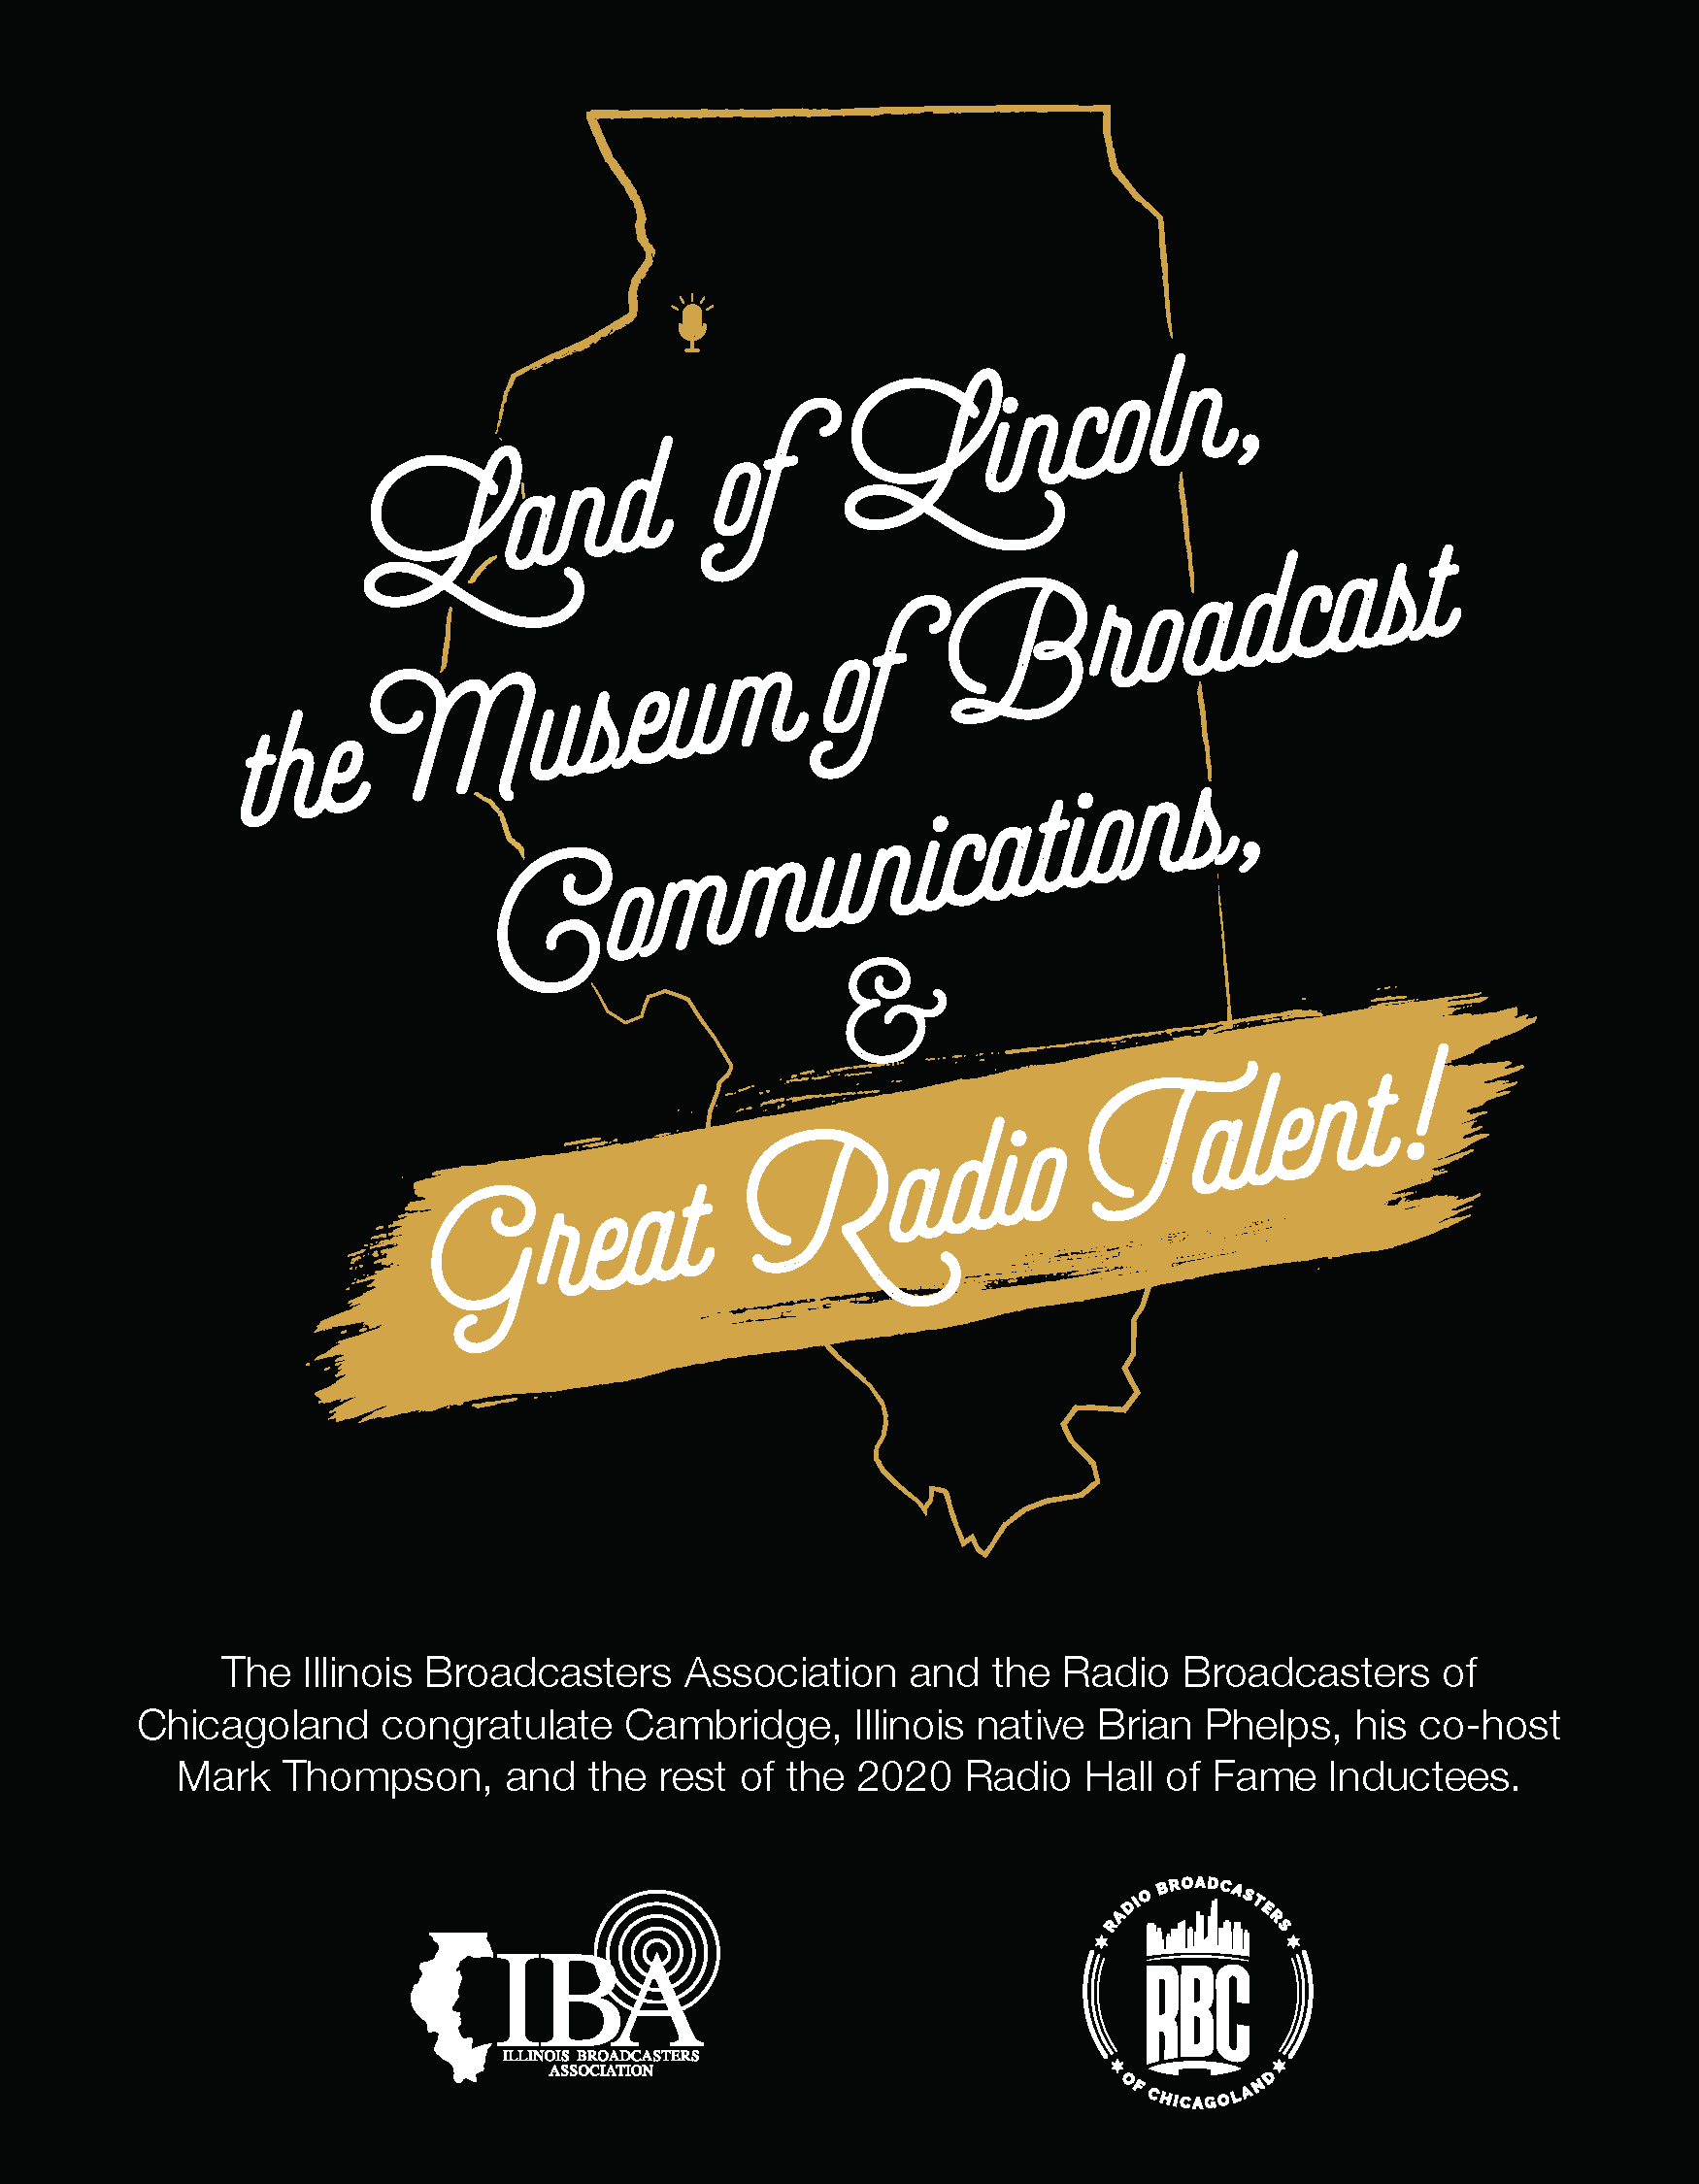 Illinois Broadcasters Association Magazine Ad